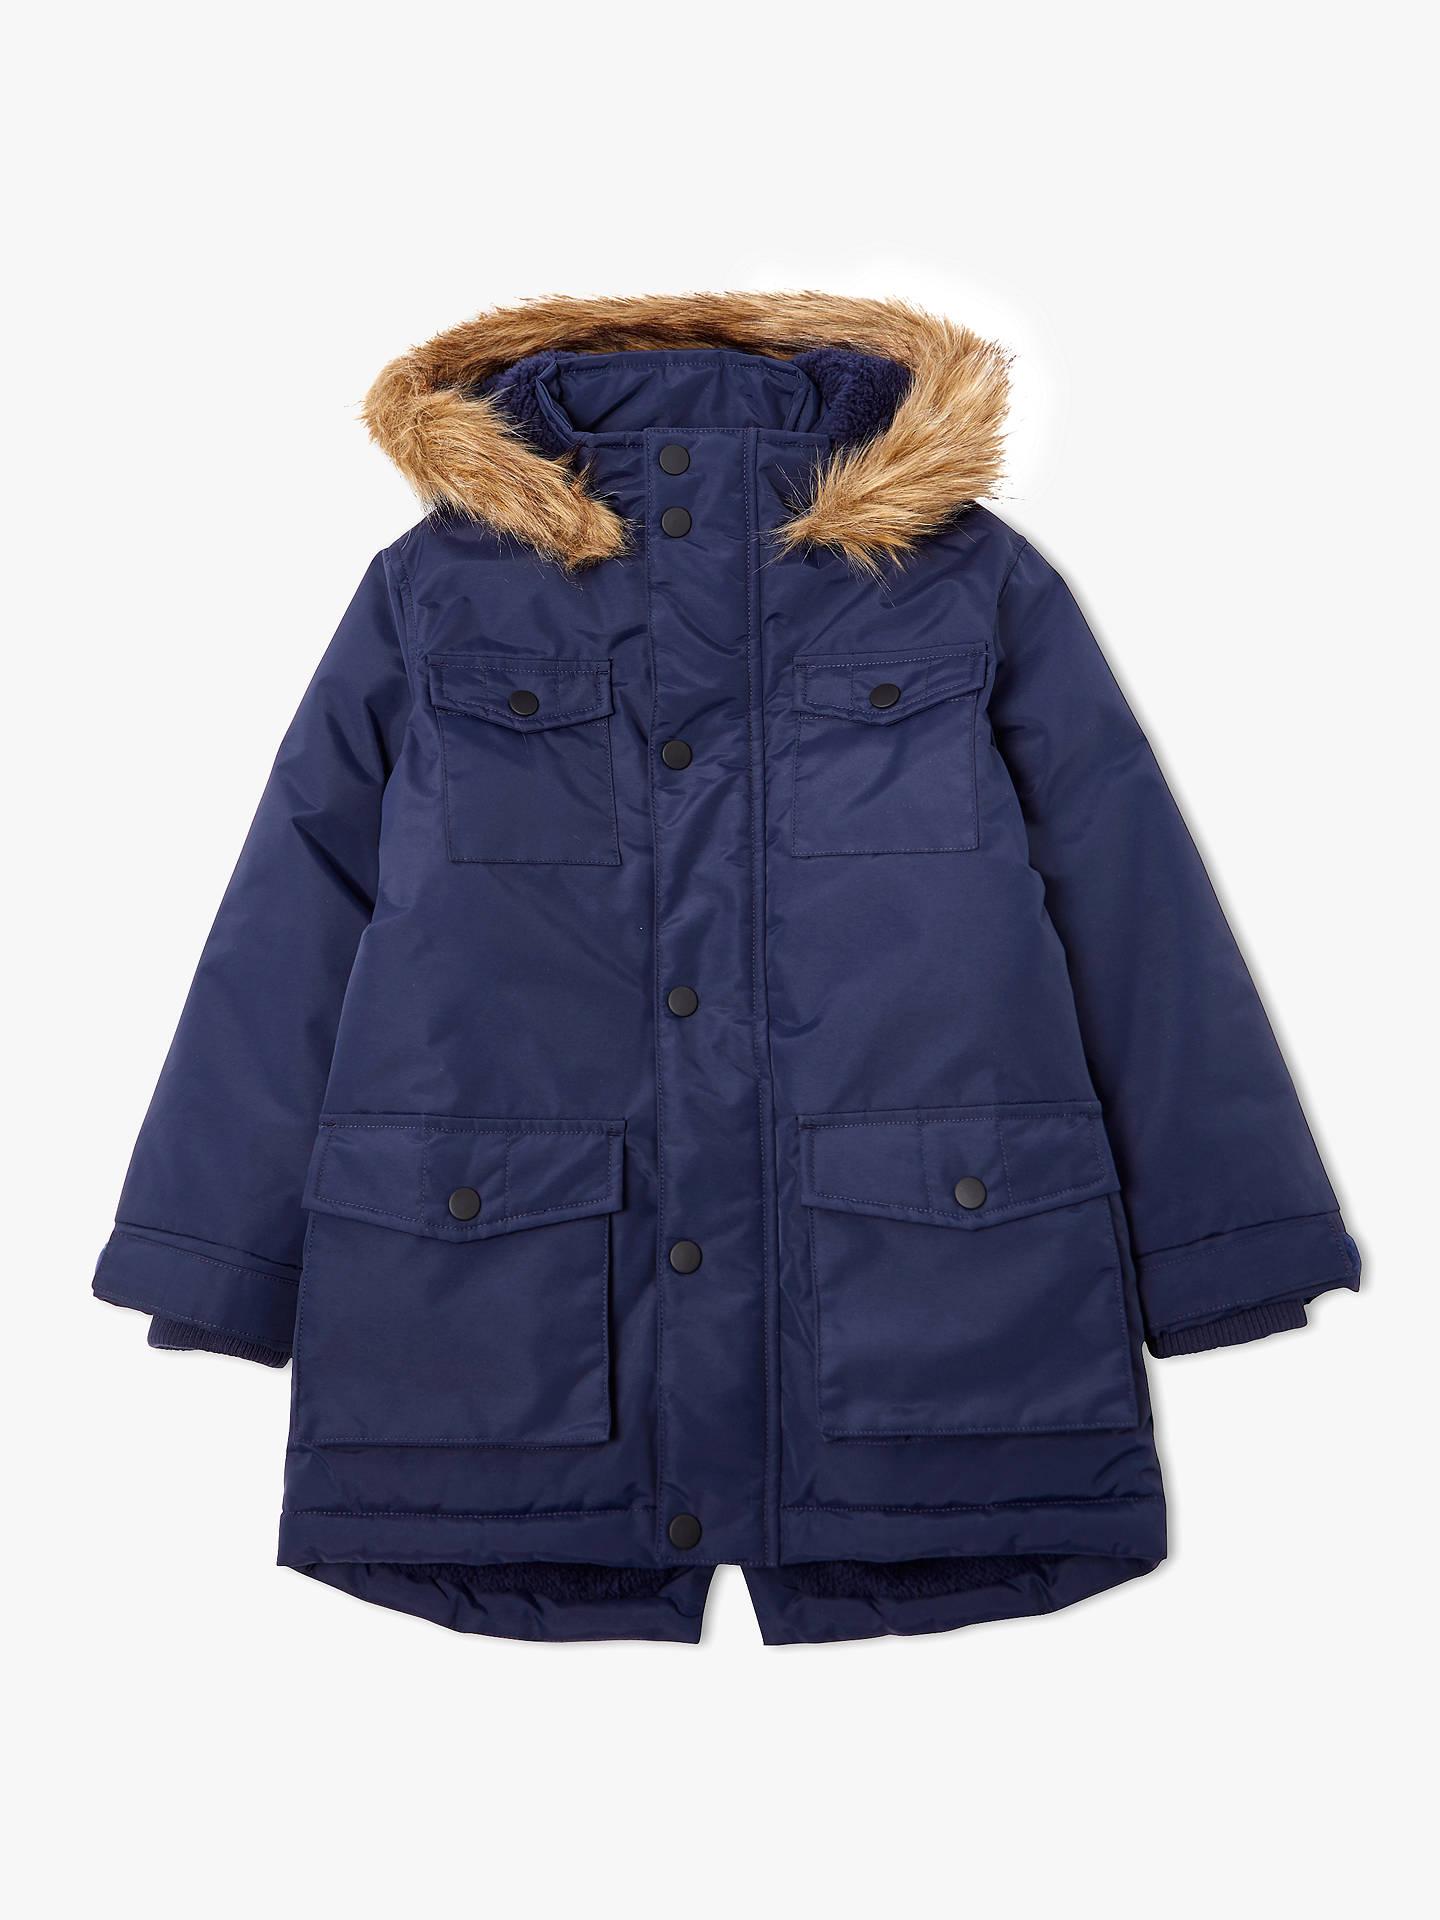 c48f1ac5221 Buy John Lewis & Partners Boys' Four Pocket Parka Coat, Navy, 2 years ...